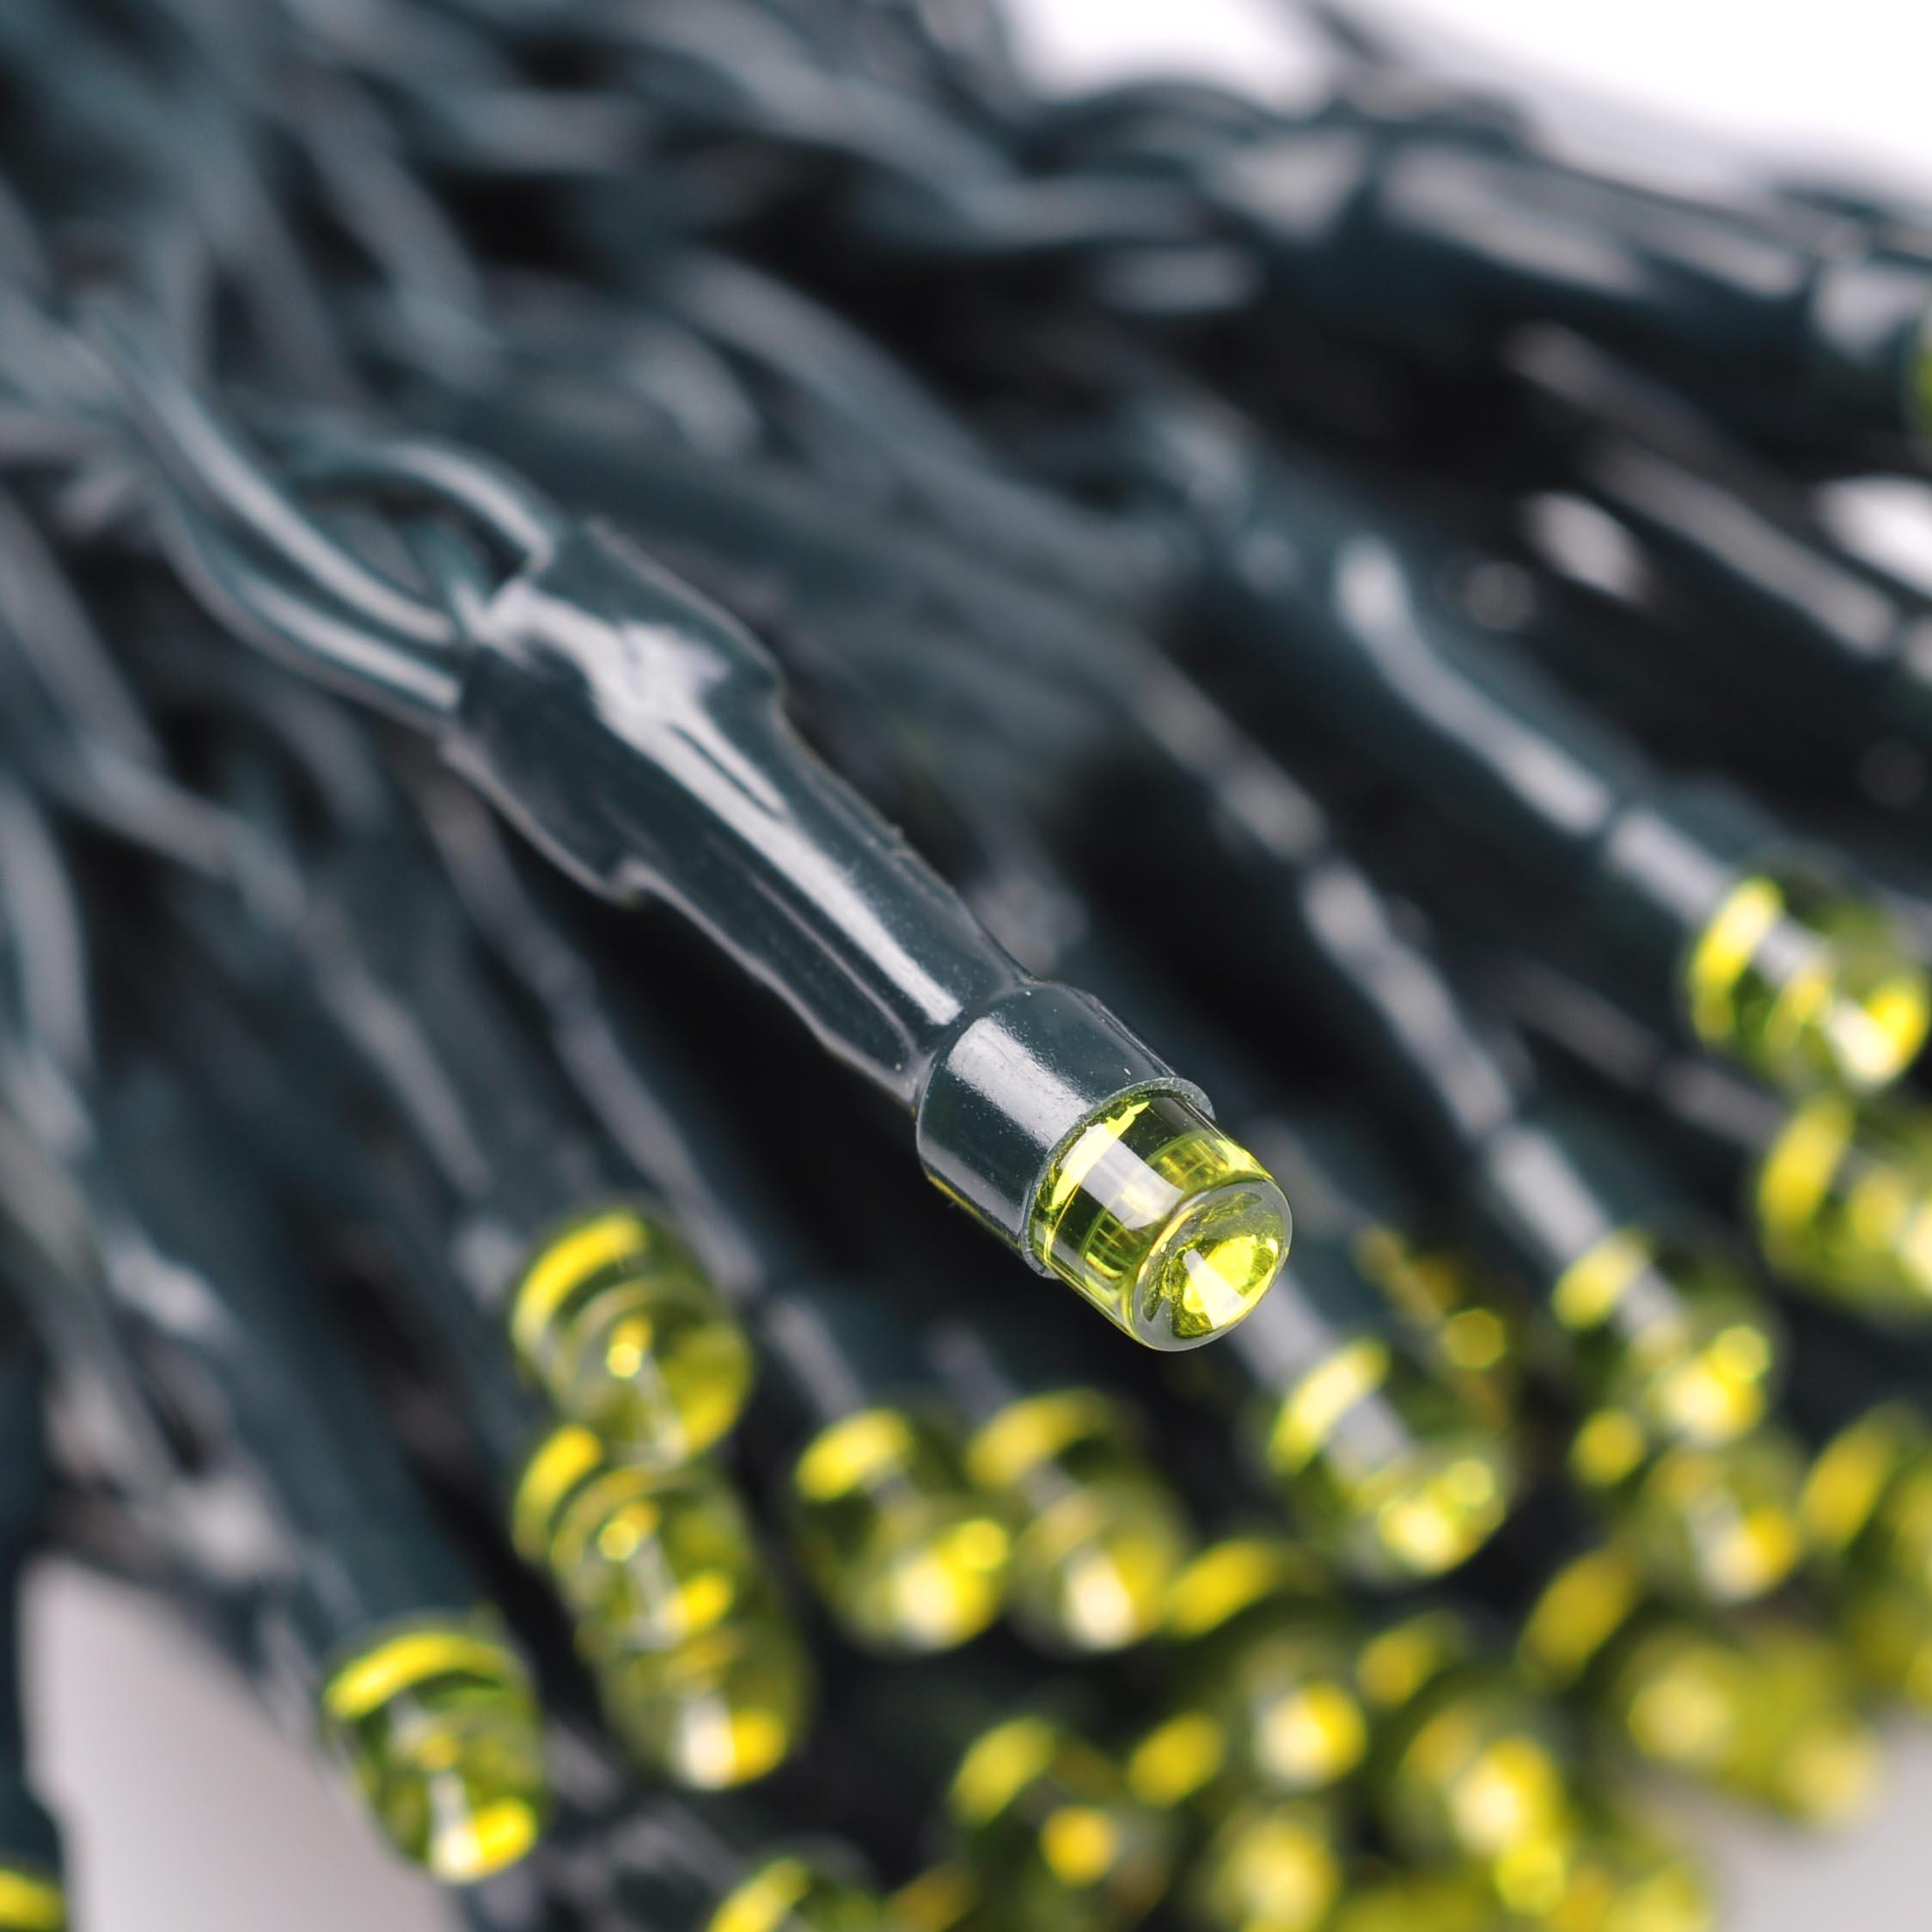 100-LED-Solar-Power-String-Light-Outdoor-Garden-Christmas-Party-Decor-Lamp-Fairy thumbnail 35